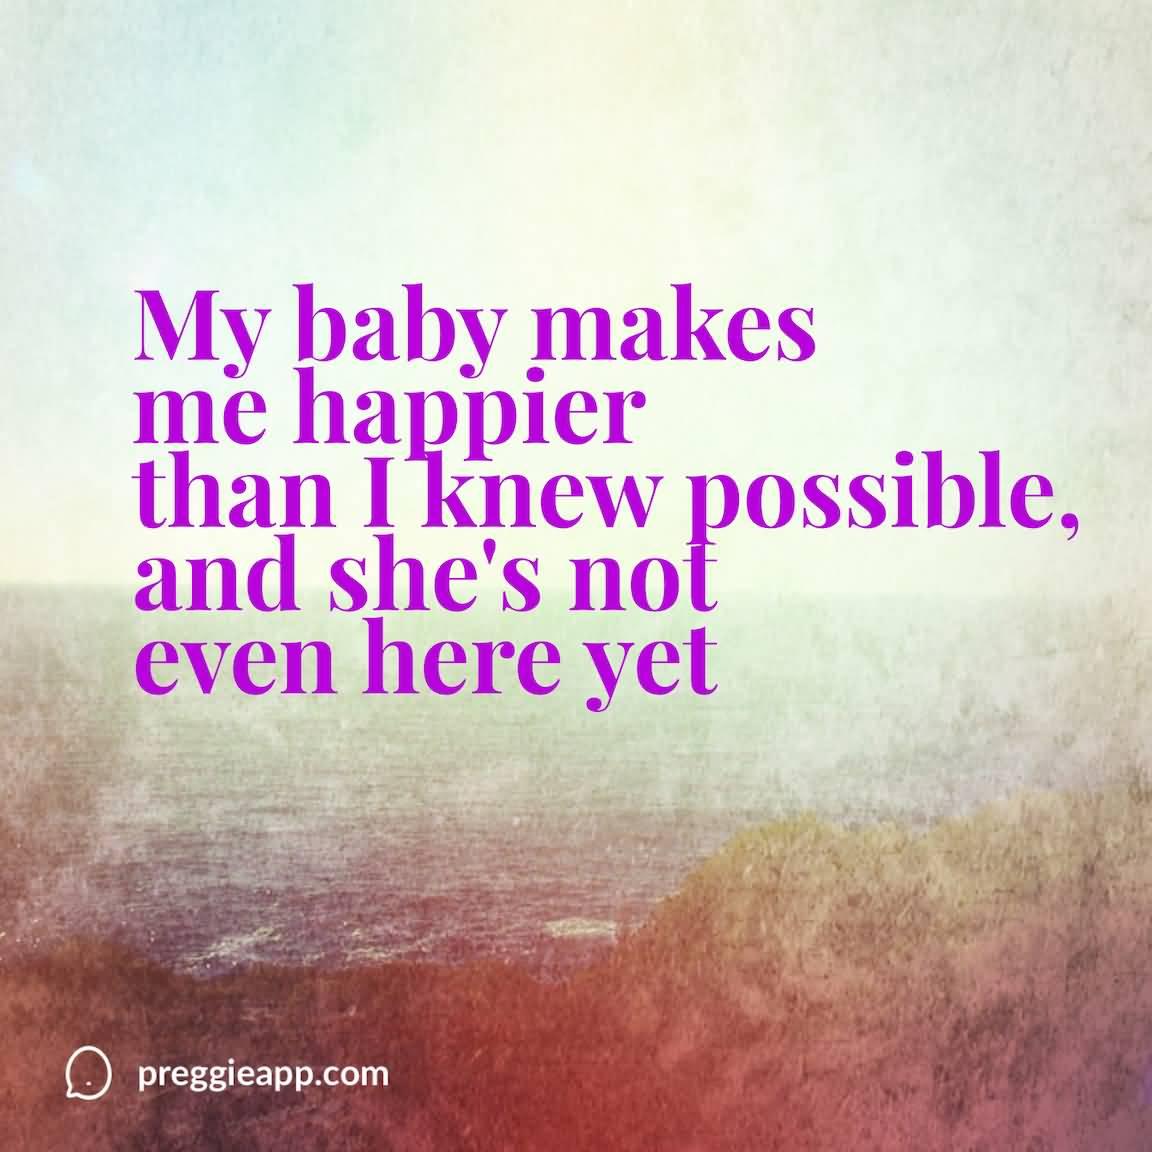 57 Nice Short Baby Quotes, Sayings & Slogans   Picsmine